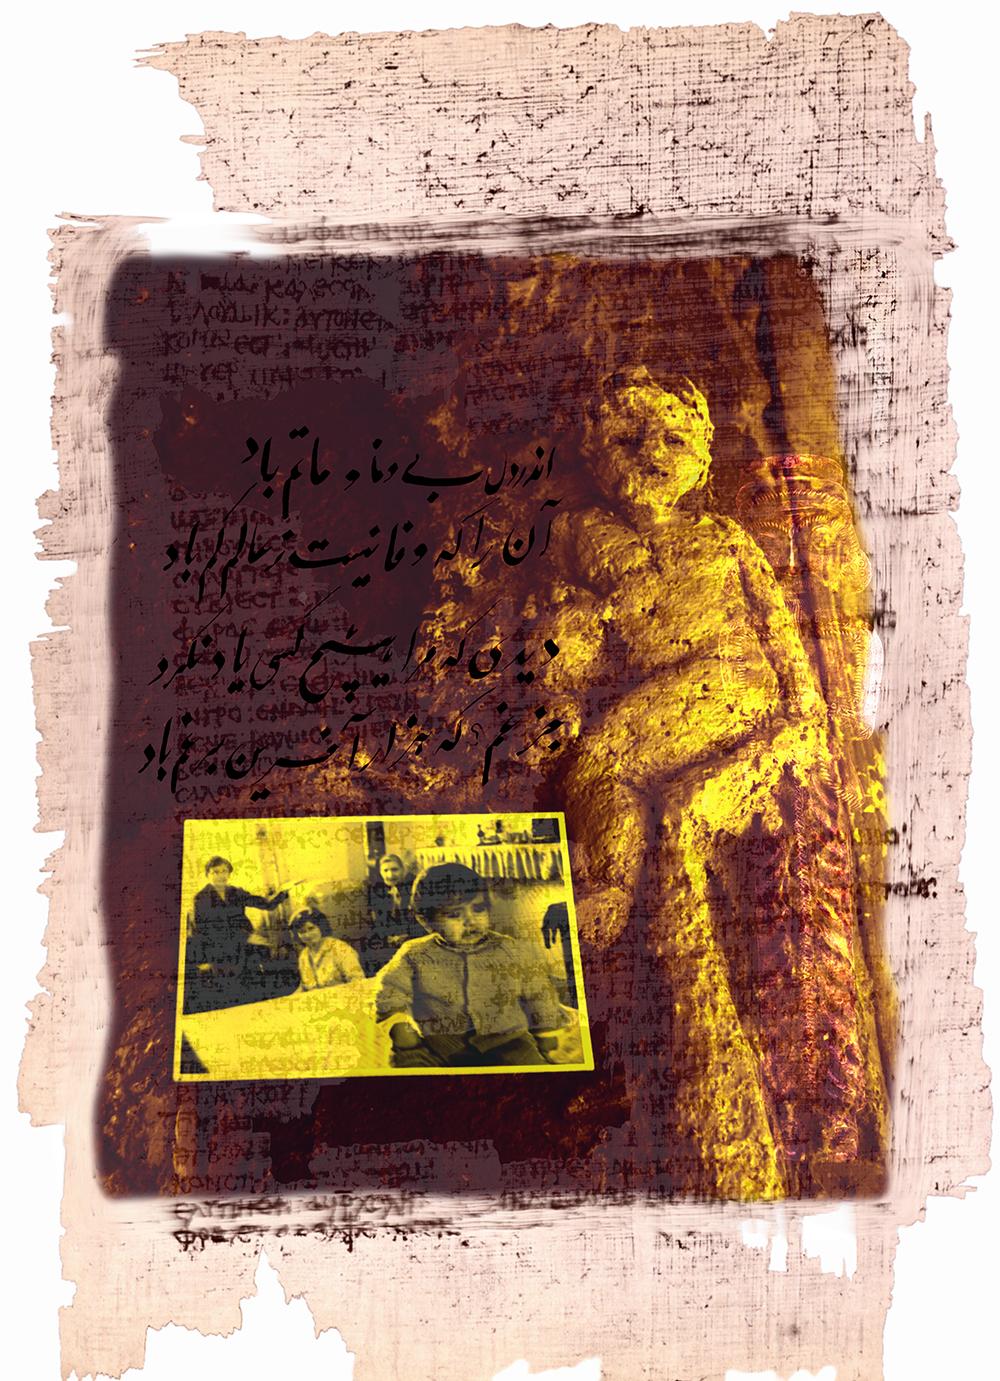 Sorrow, 2000, digital print, 30 x 22 in.